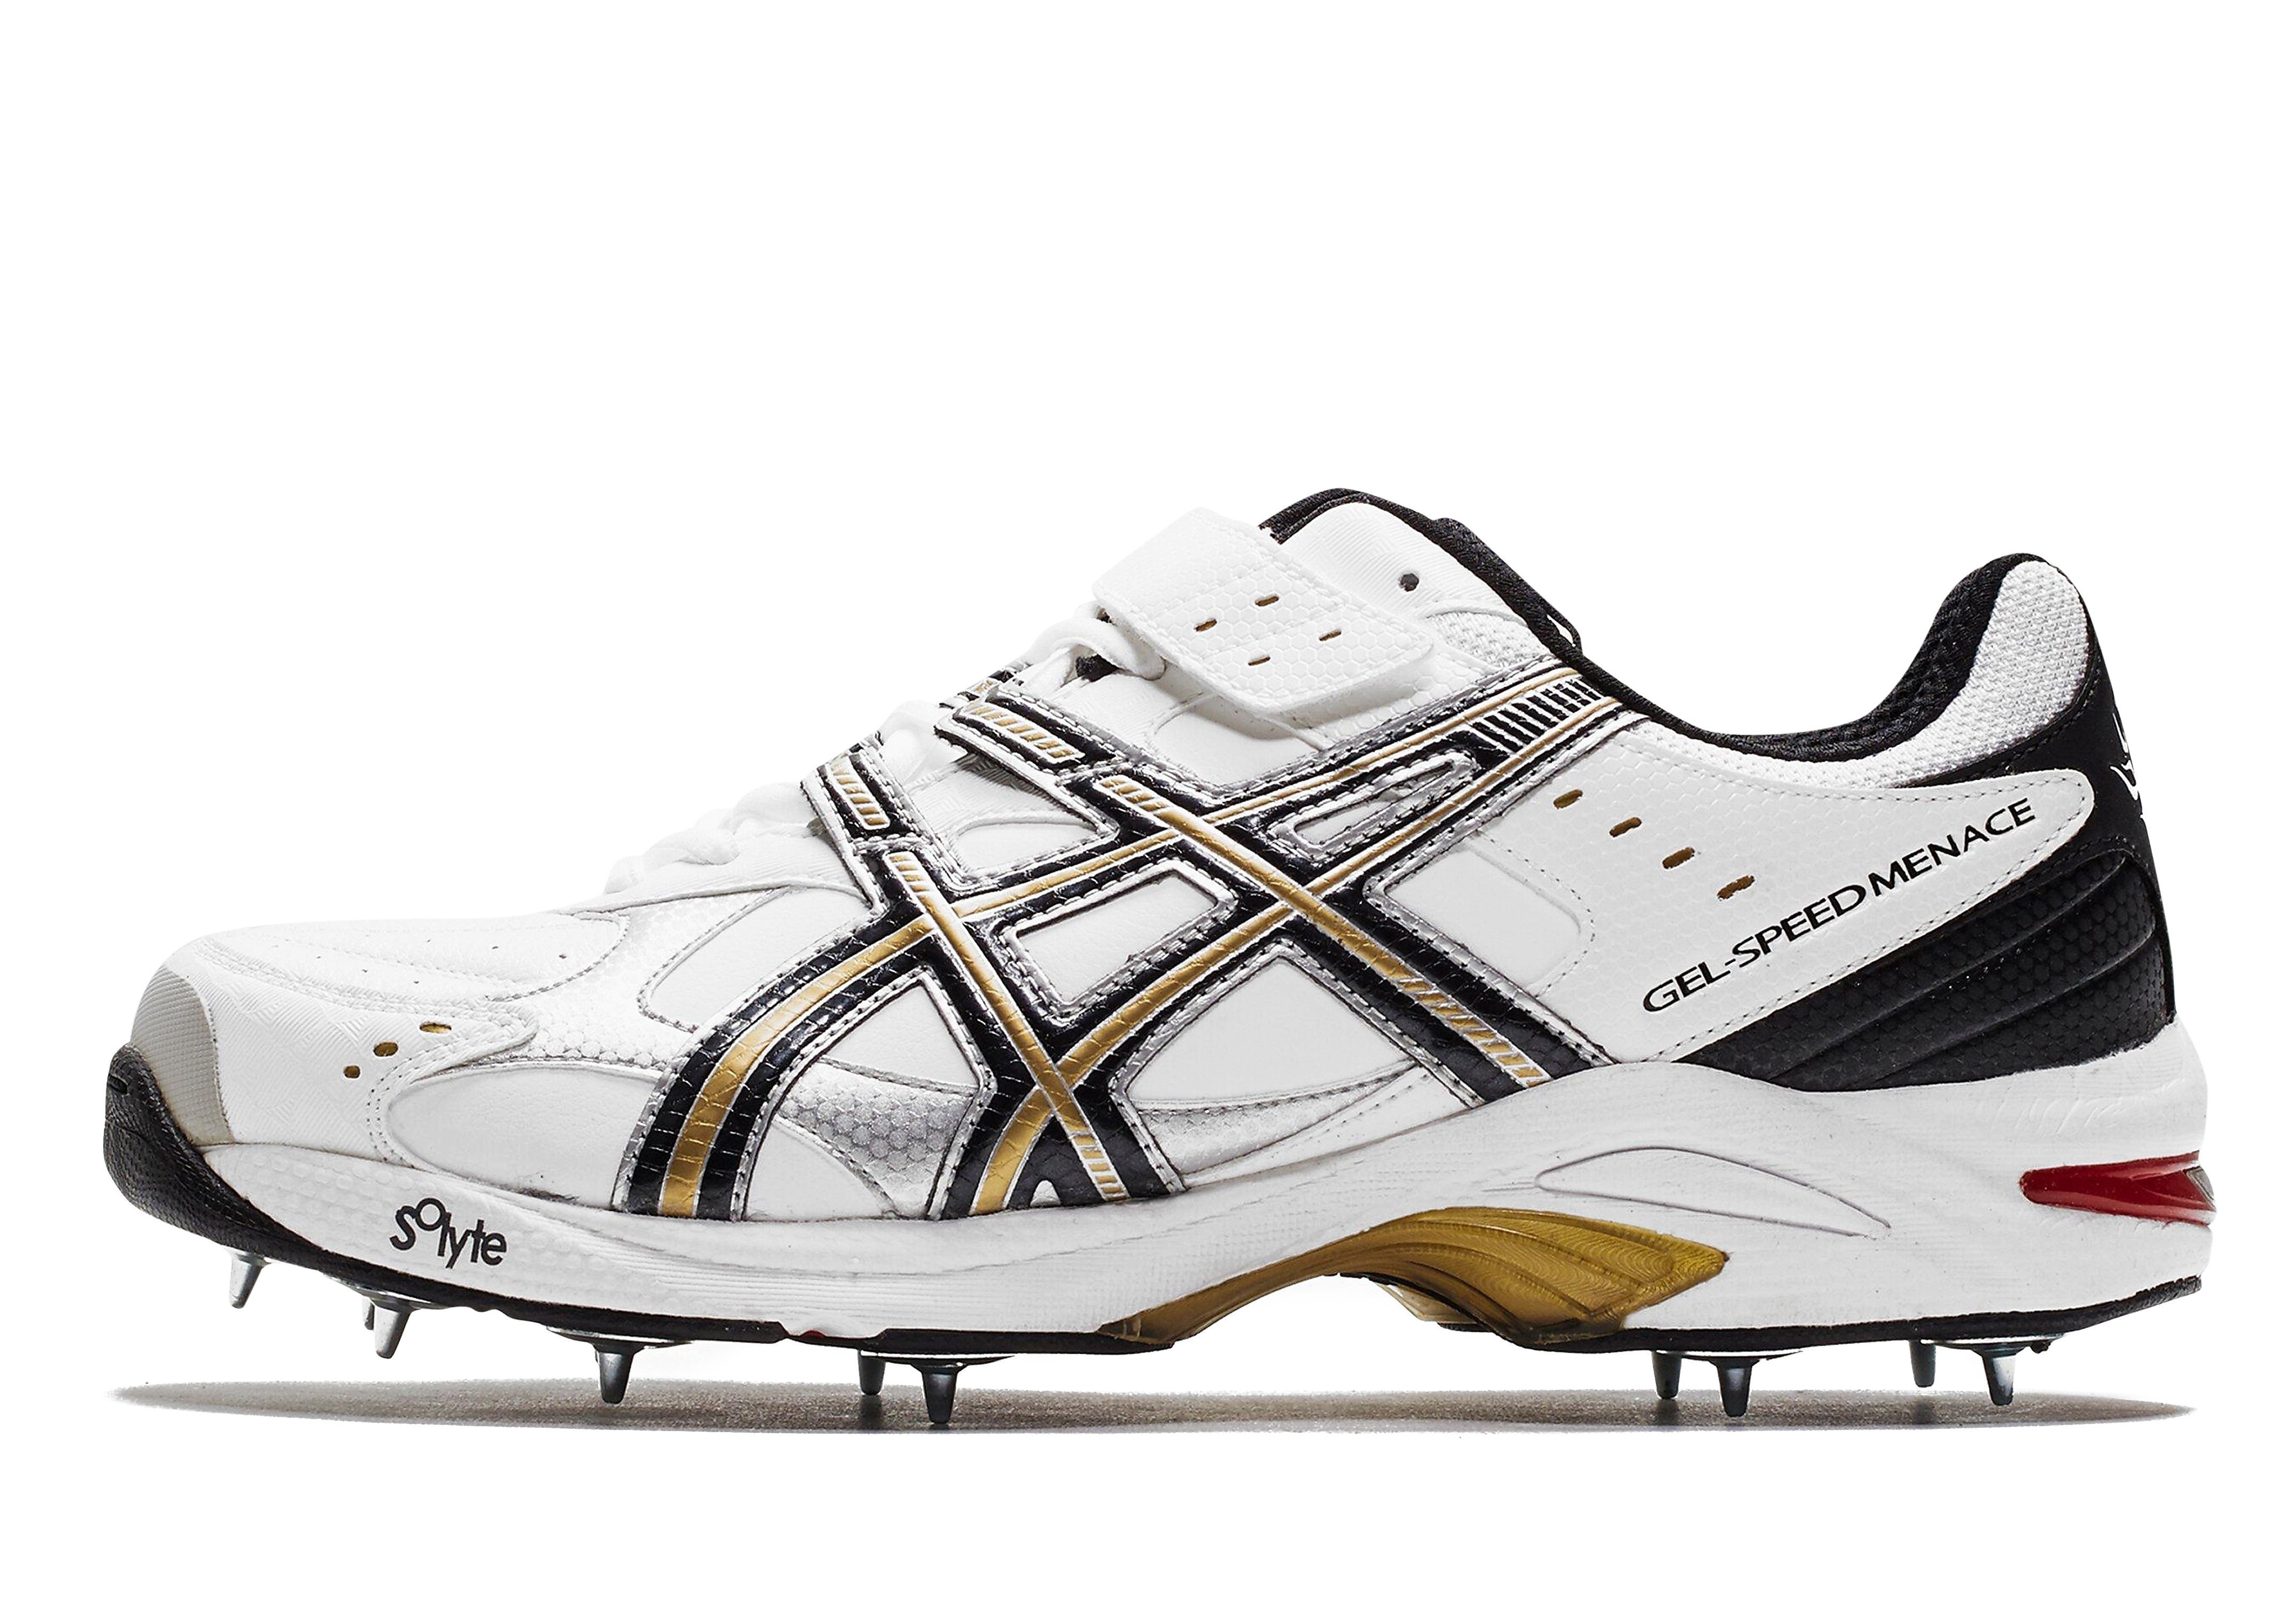 ASICS Gel-Speed Menace Cricket Shoe